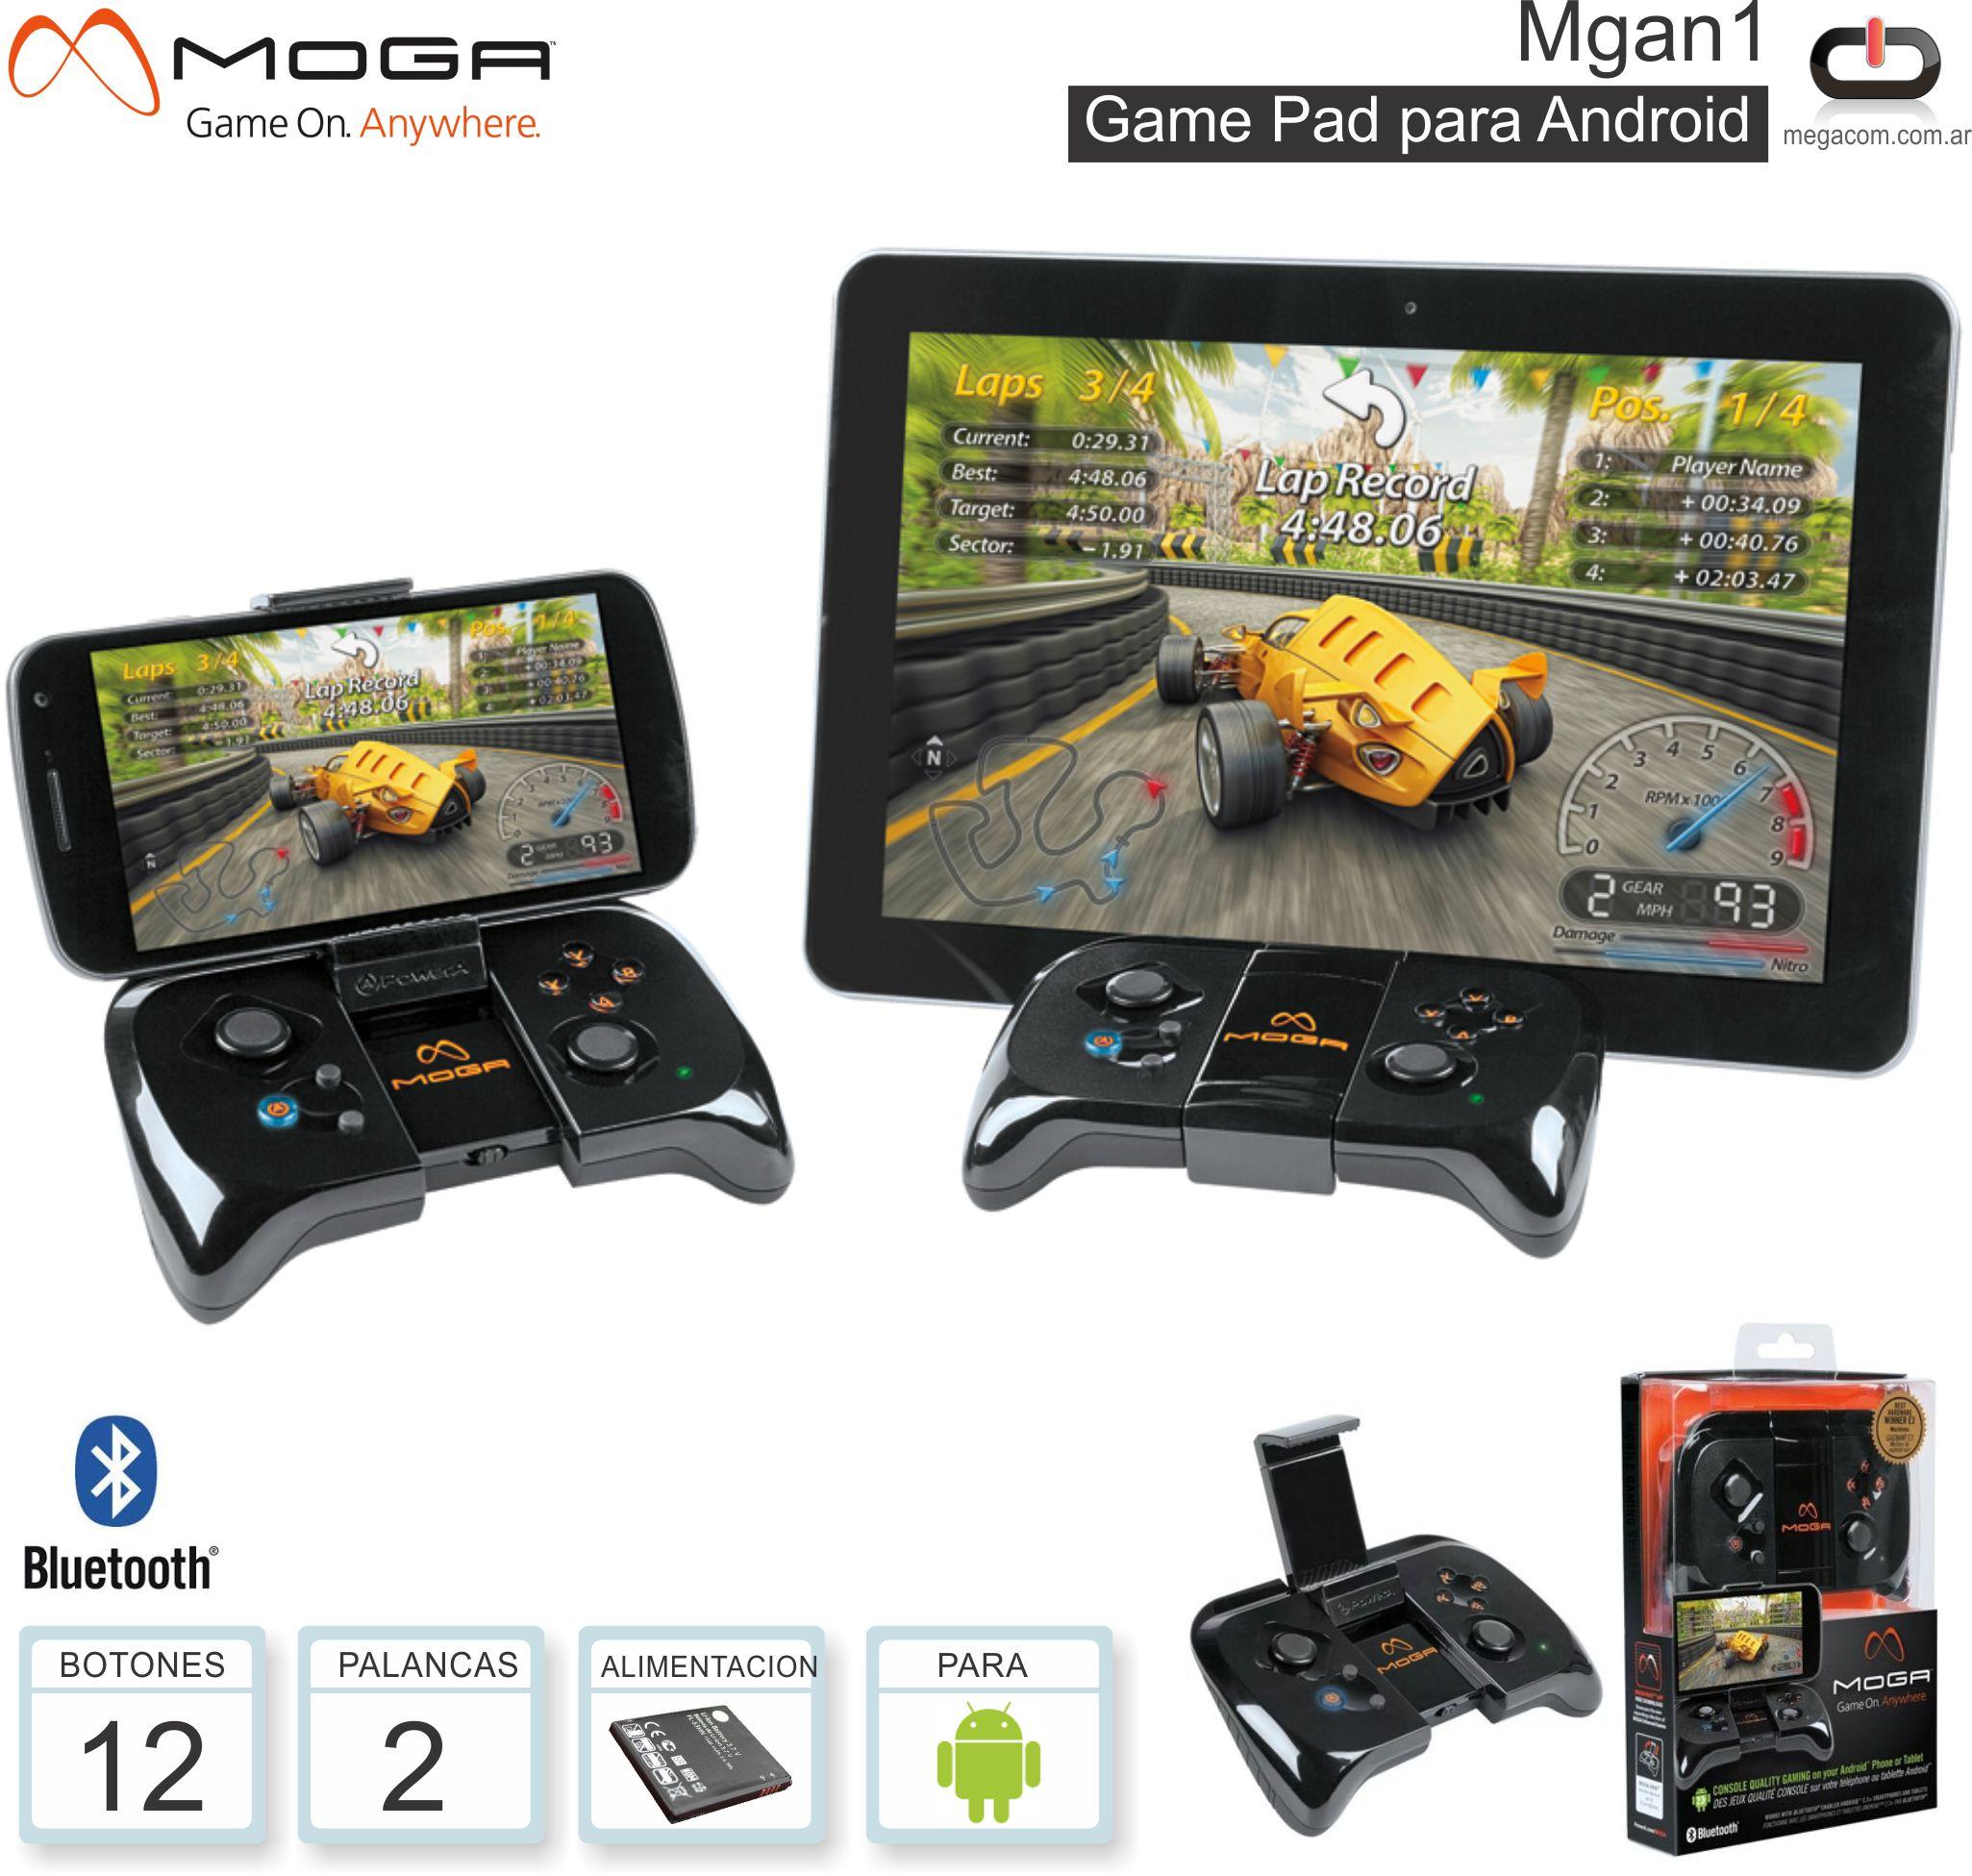 MEGACOM - Distribuidor Mayorista de Hardware e Insumos en Mar del Plata , juego ps4 dd ea sport ...